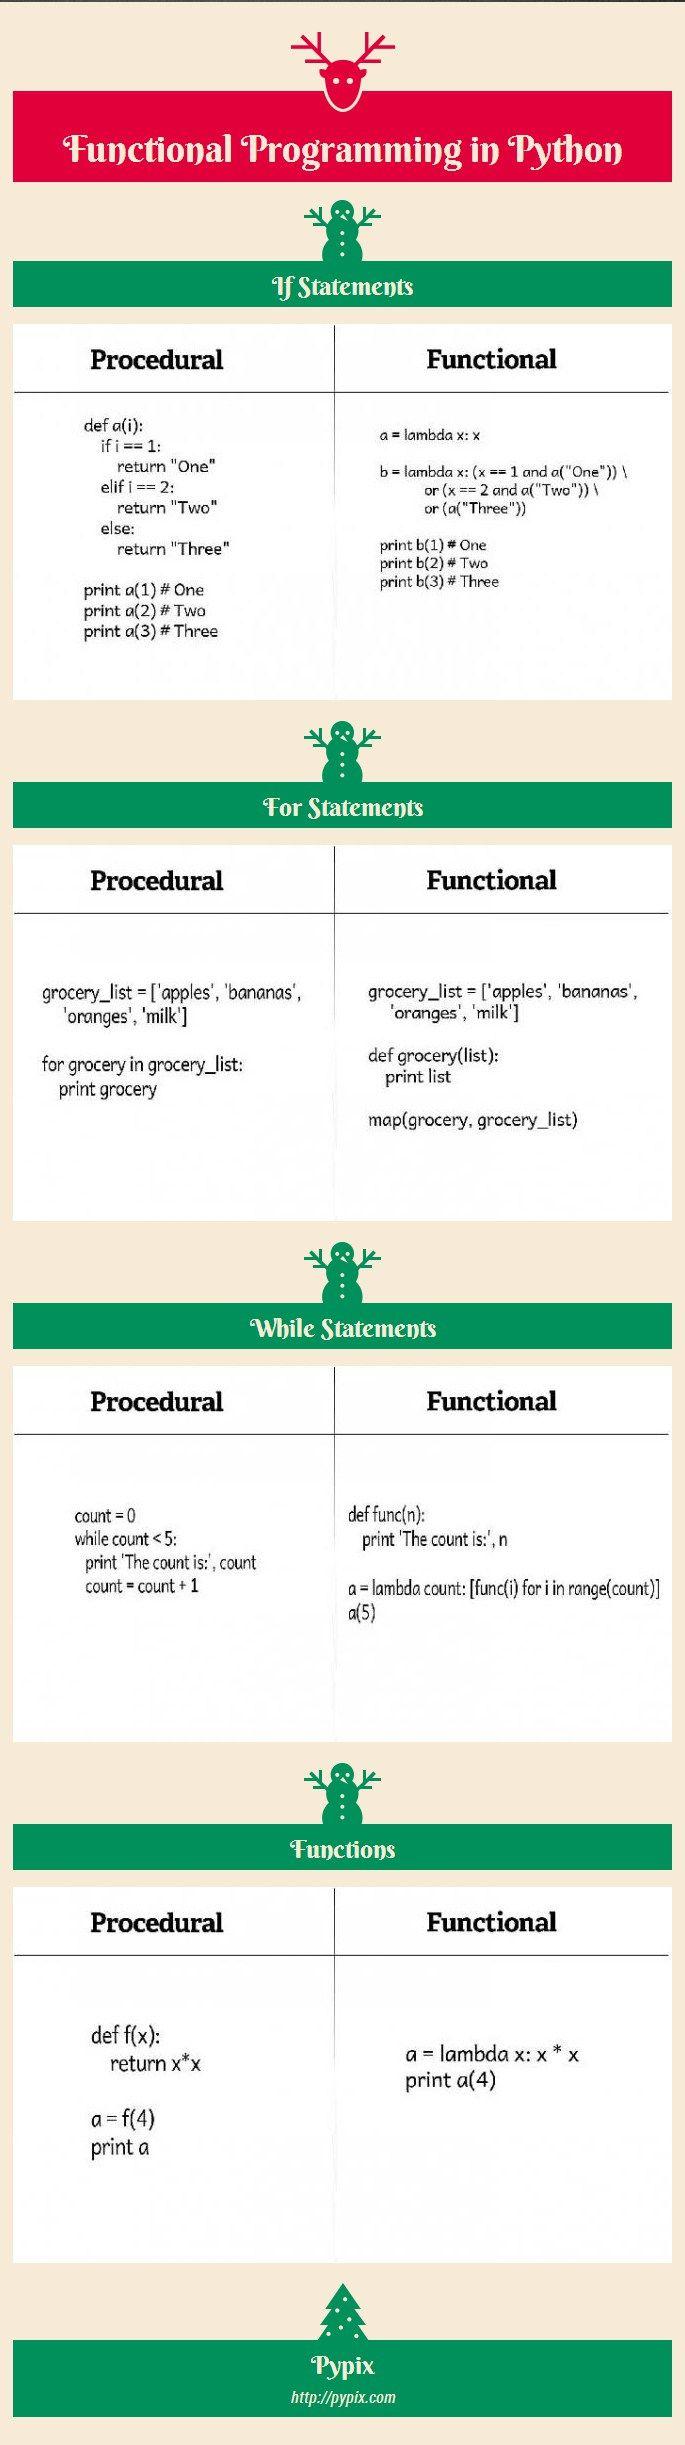 Infographic-Functional-Programming-in-Python-Infogram